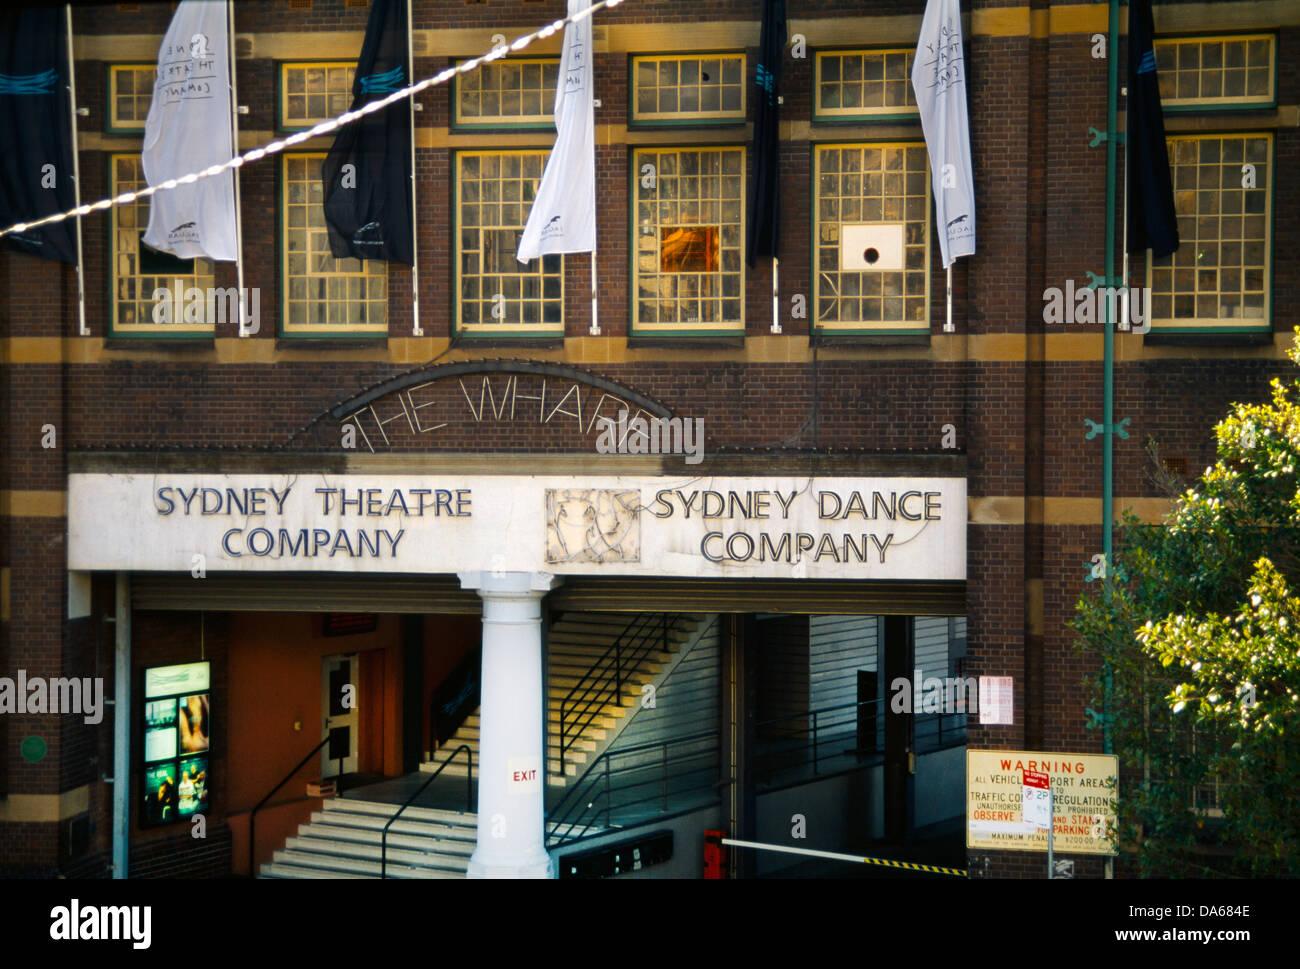 Sydney NSW Australia The Wharf Sydney Theatre & Dance Company - Stock Image